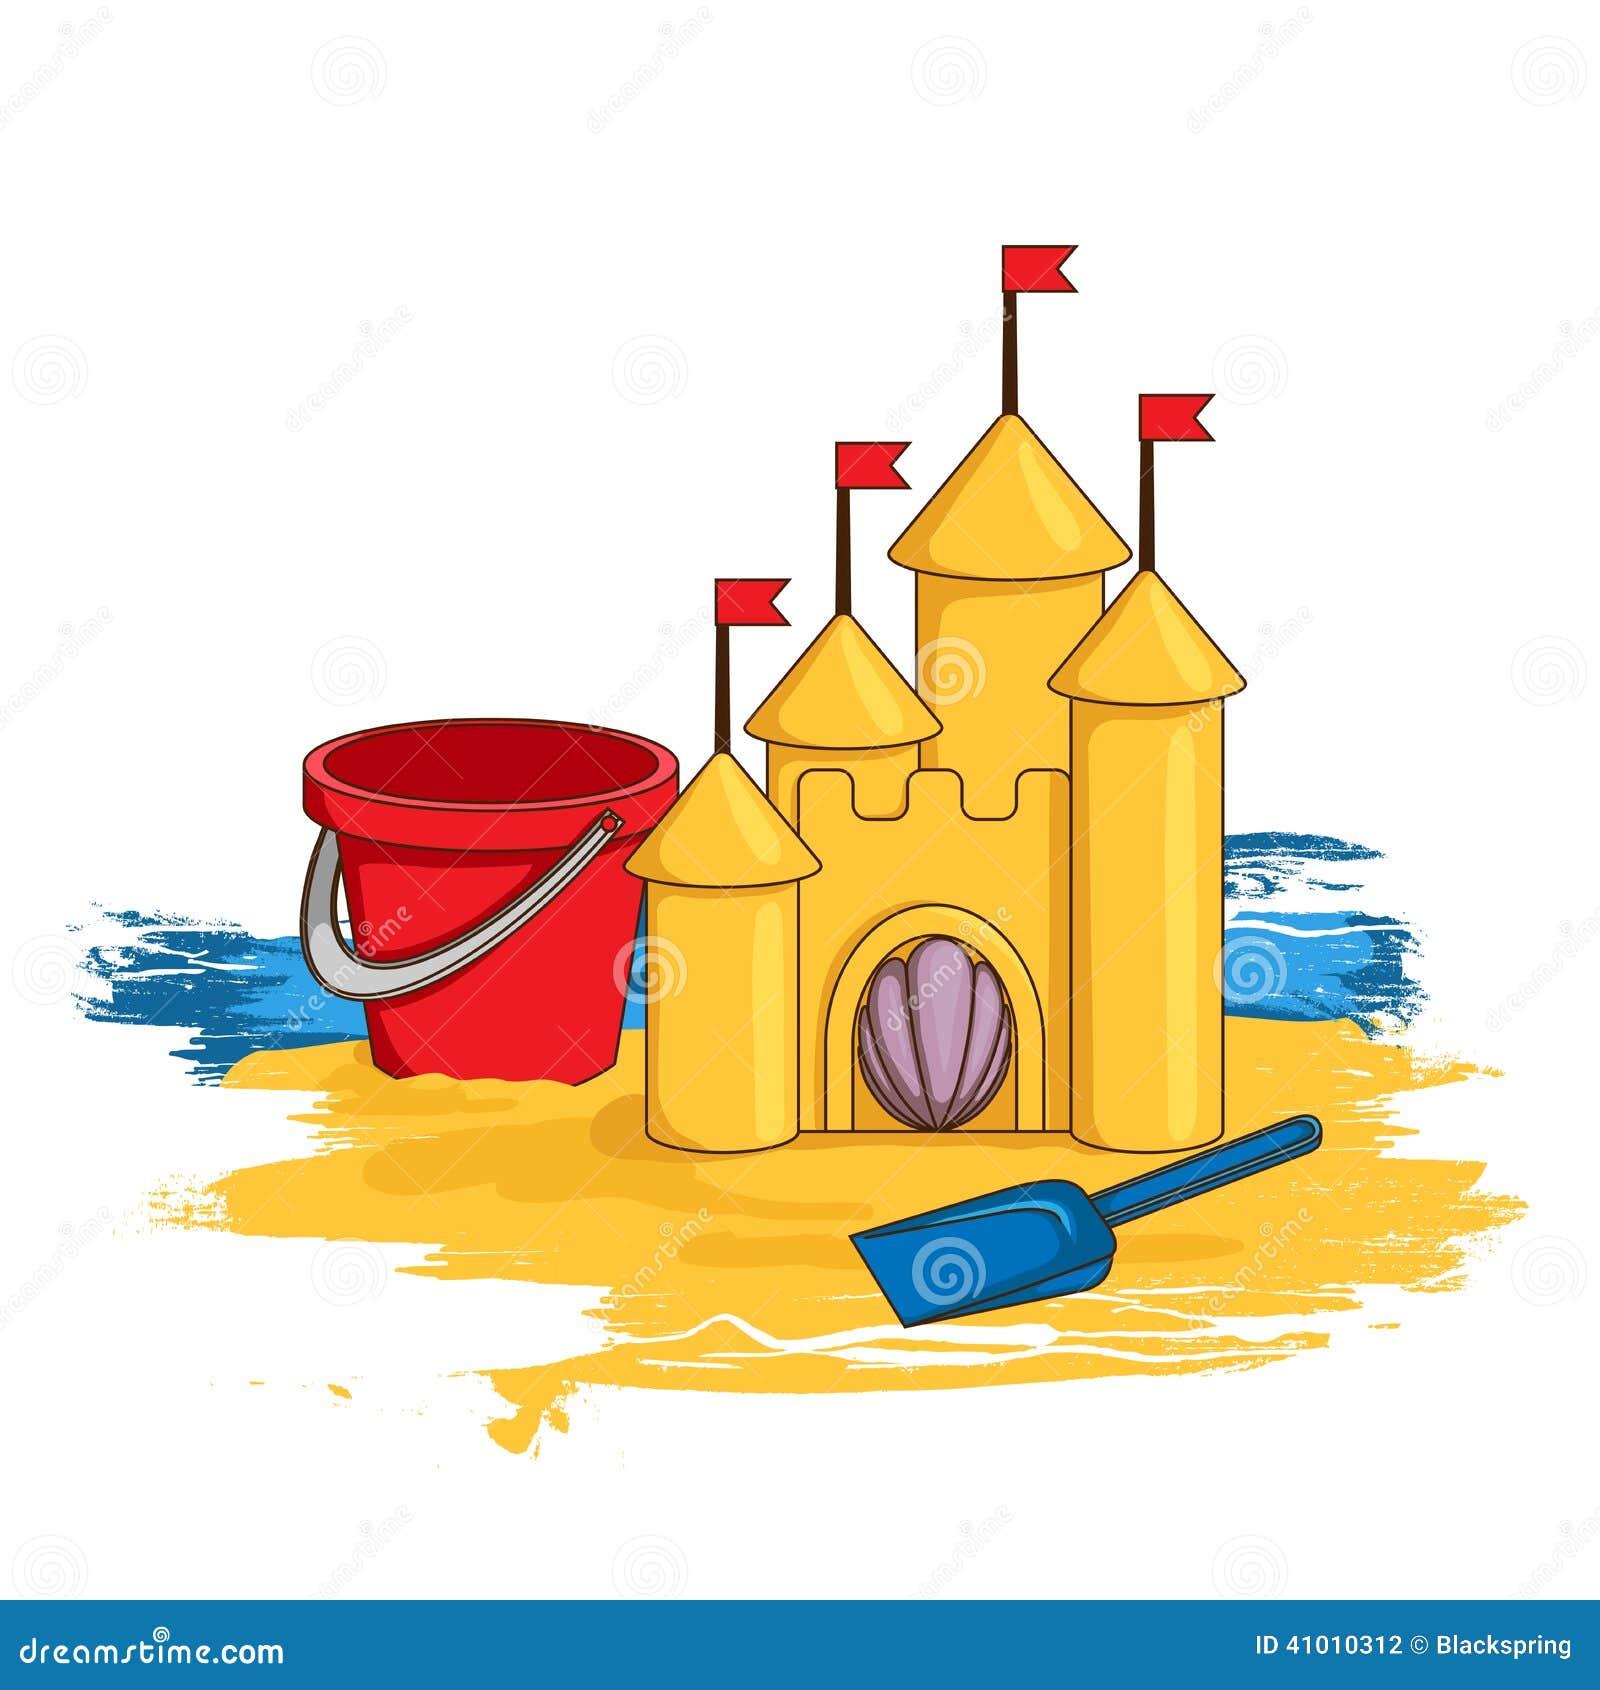 Cartoon Sand Castle Stock Vector. Illustration Of Cartoon